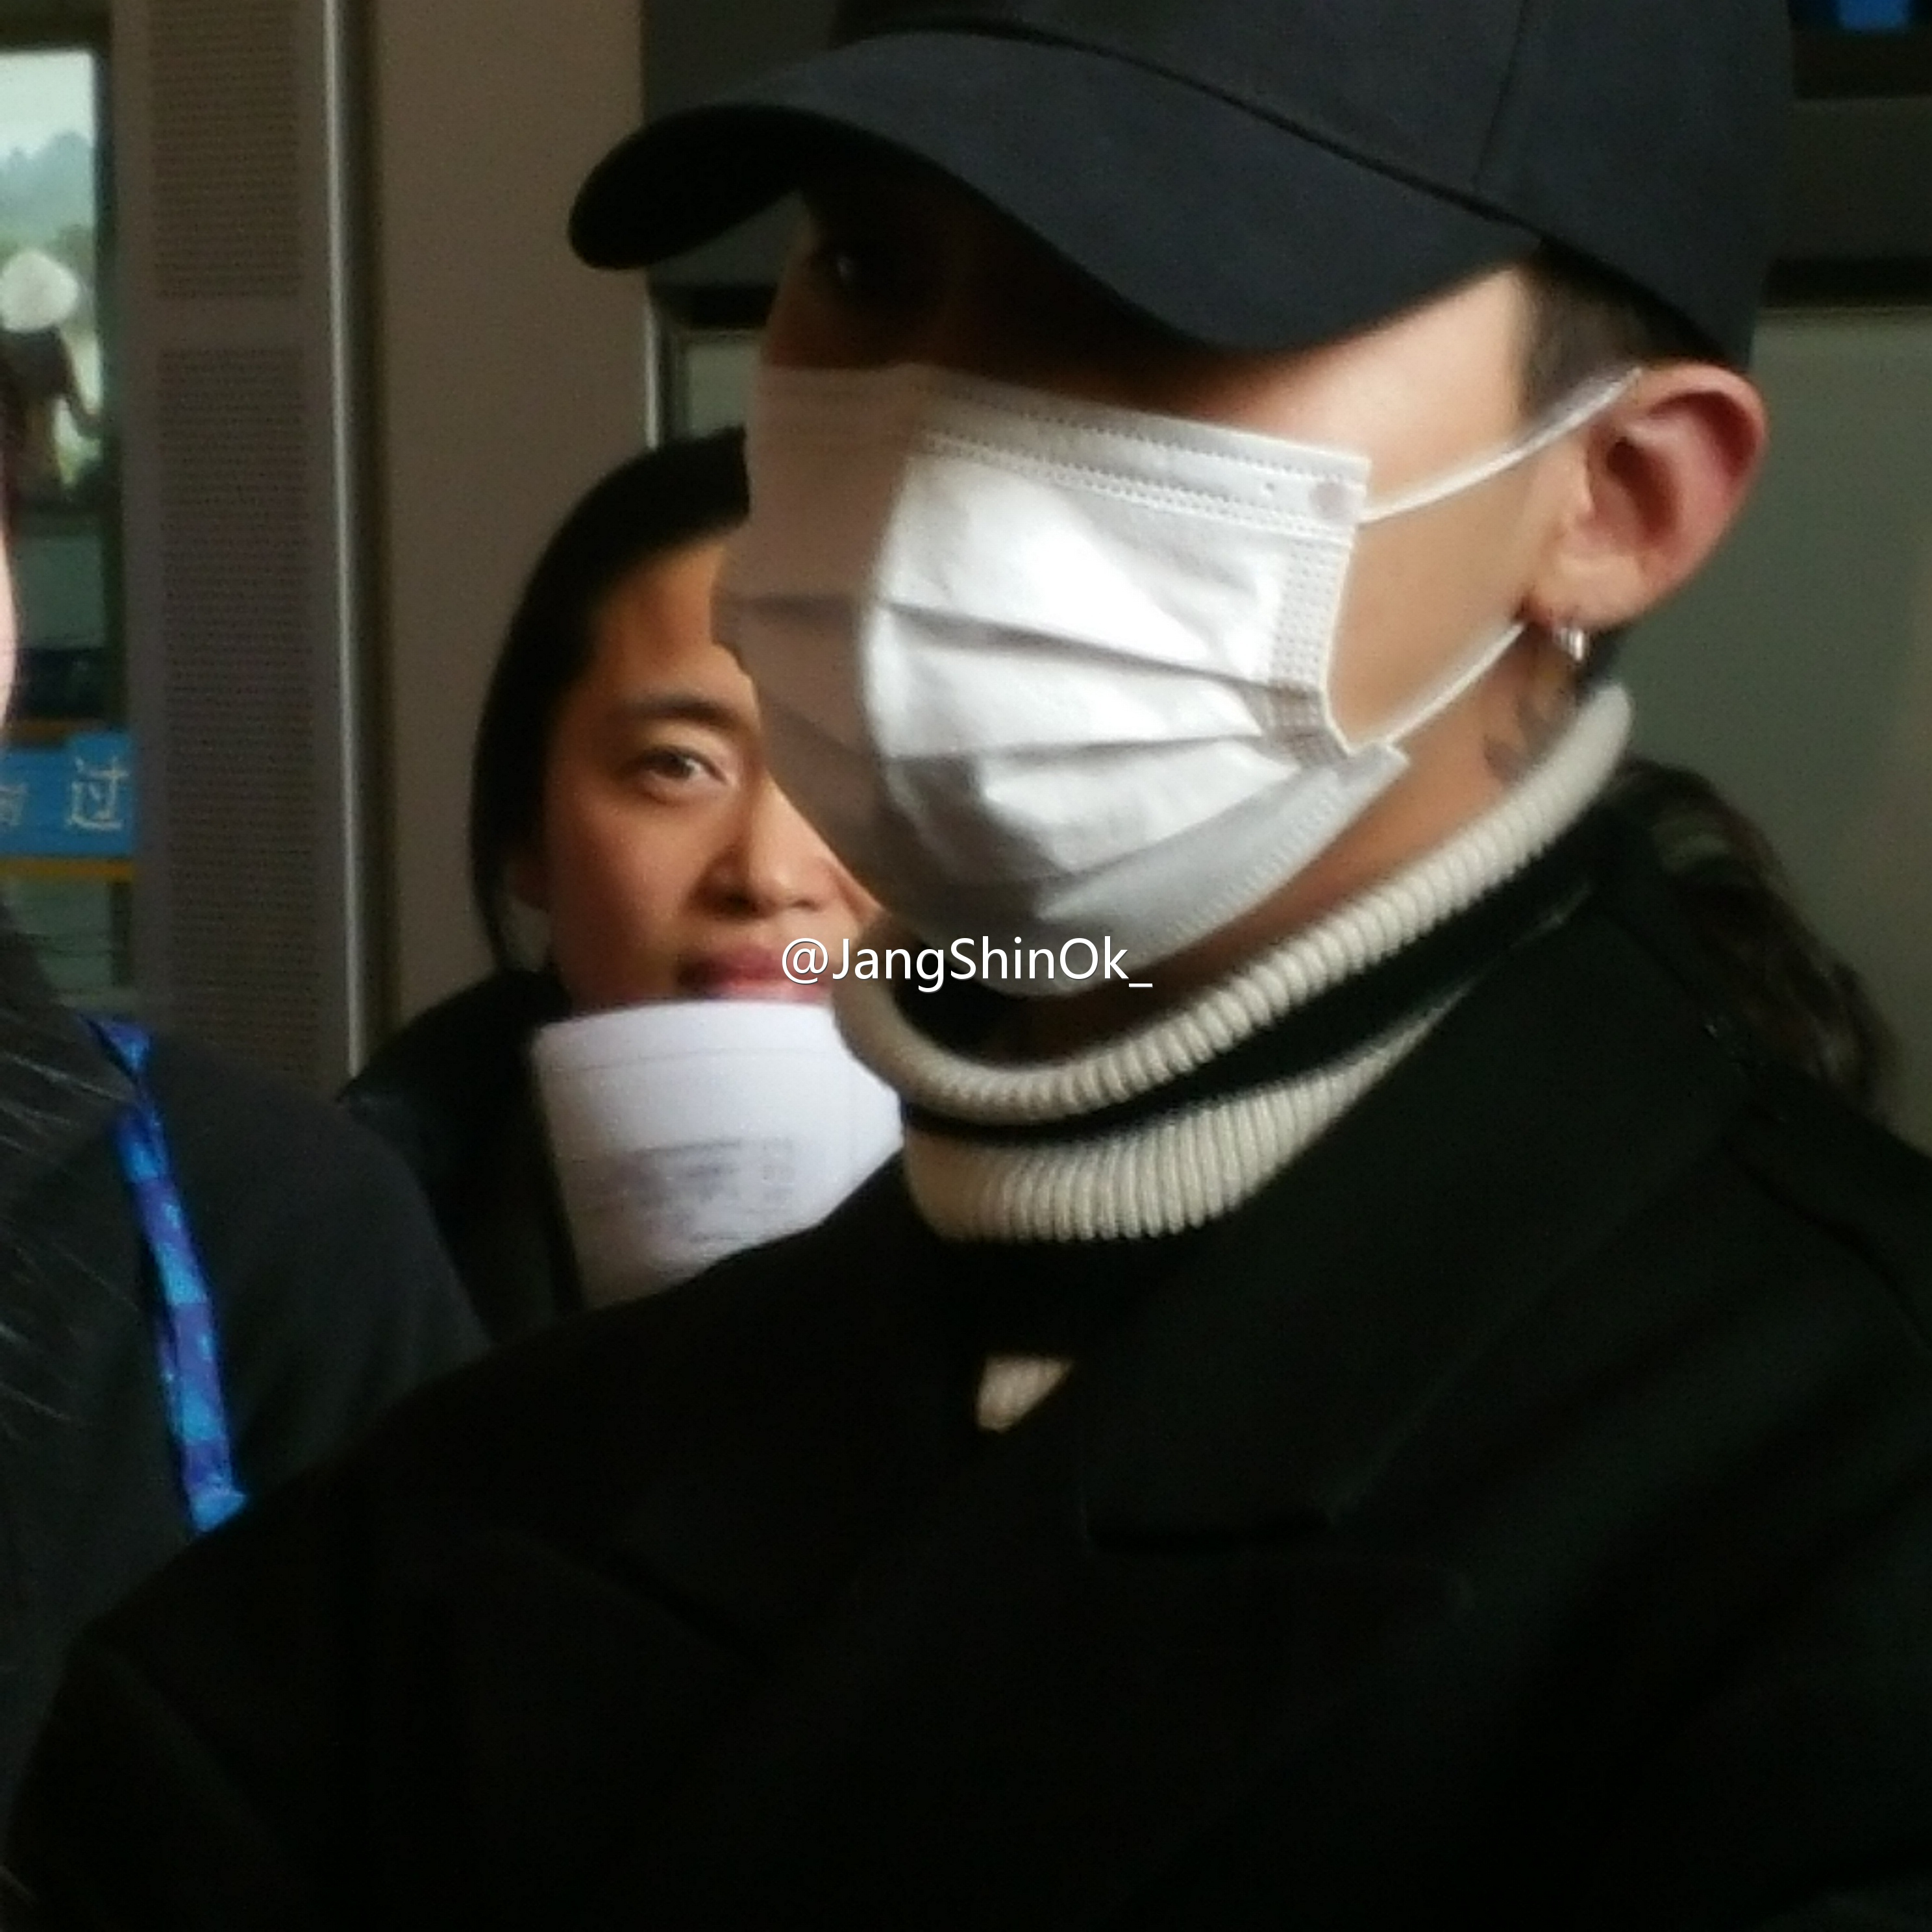 BIGBANG - Beijing Airport - 31dec2015 - JangShinOk_ - 01